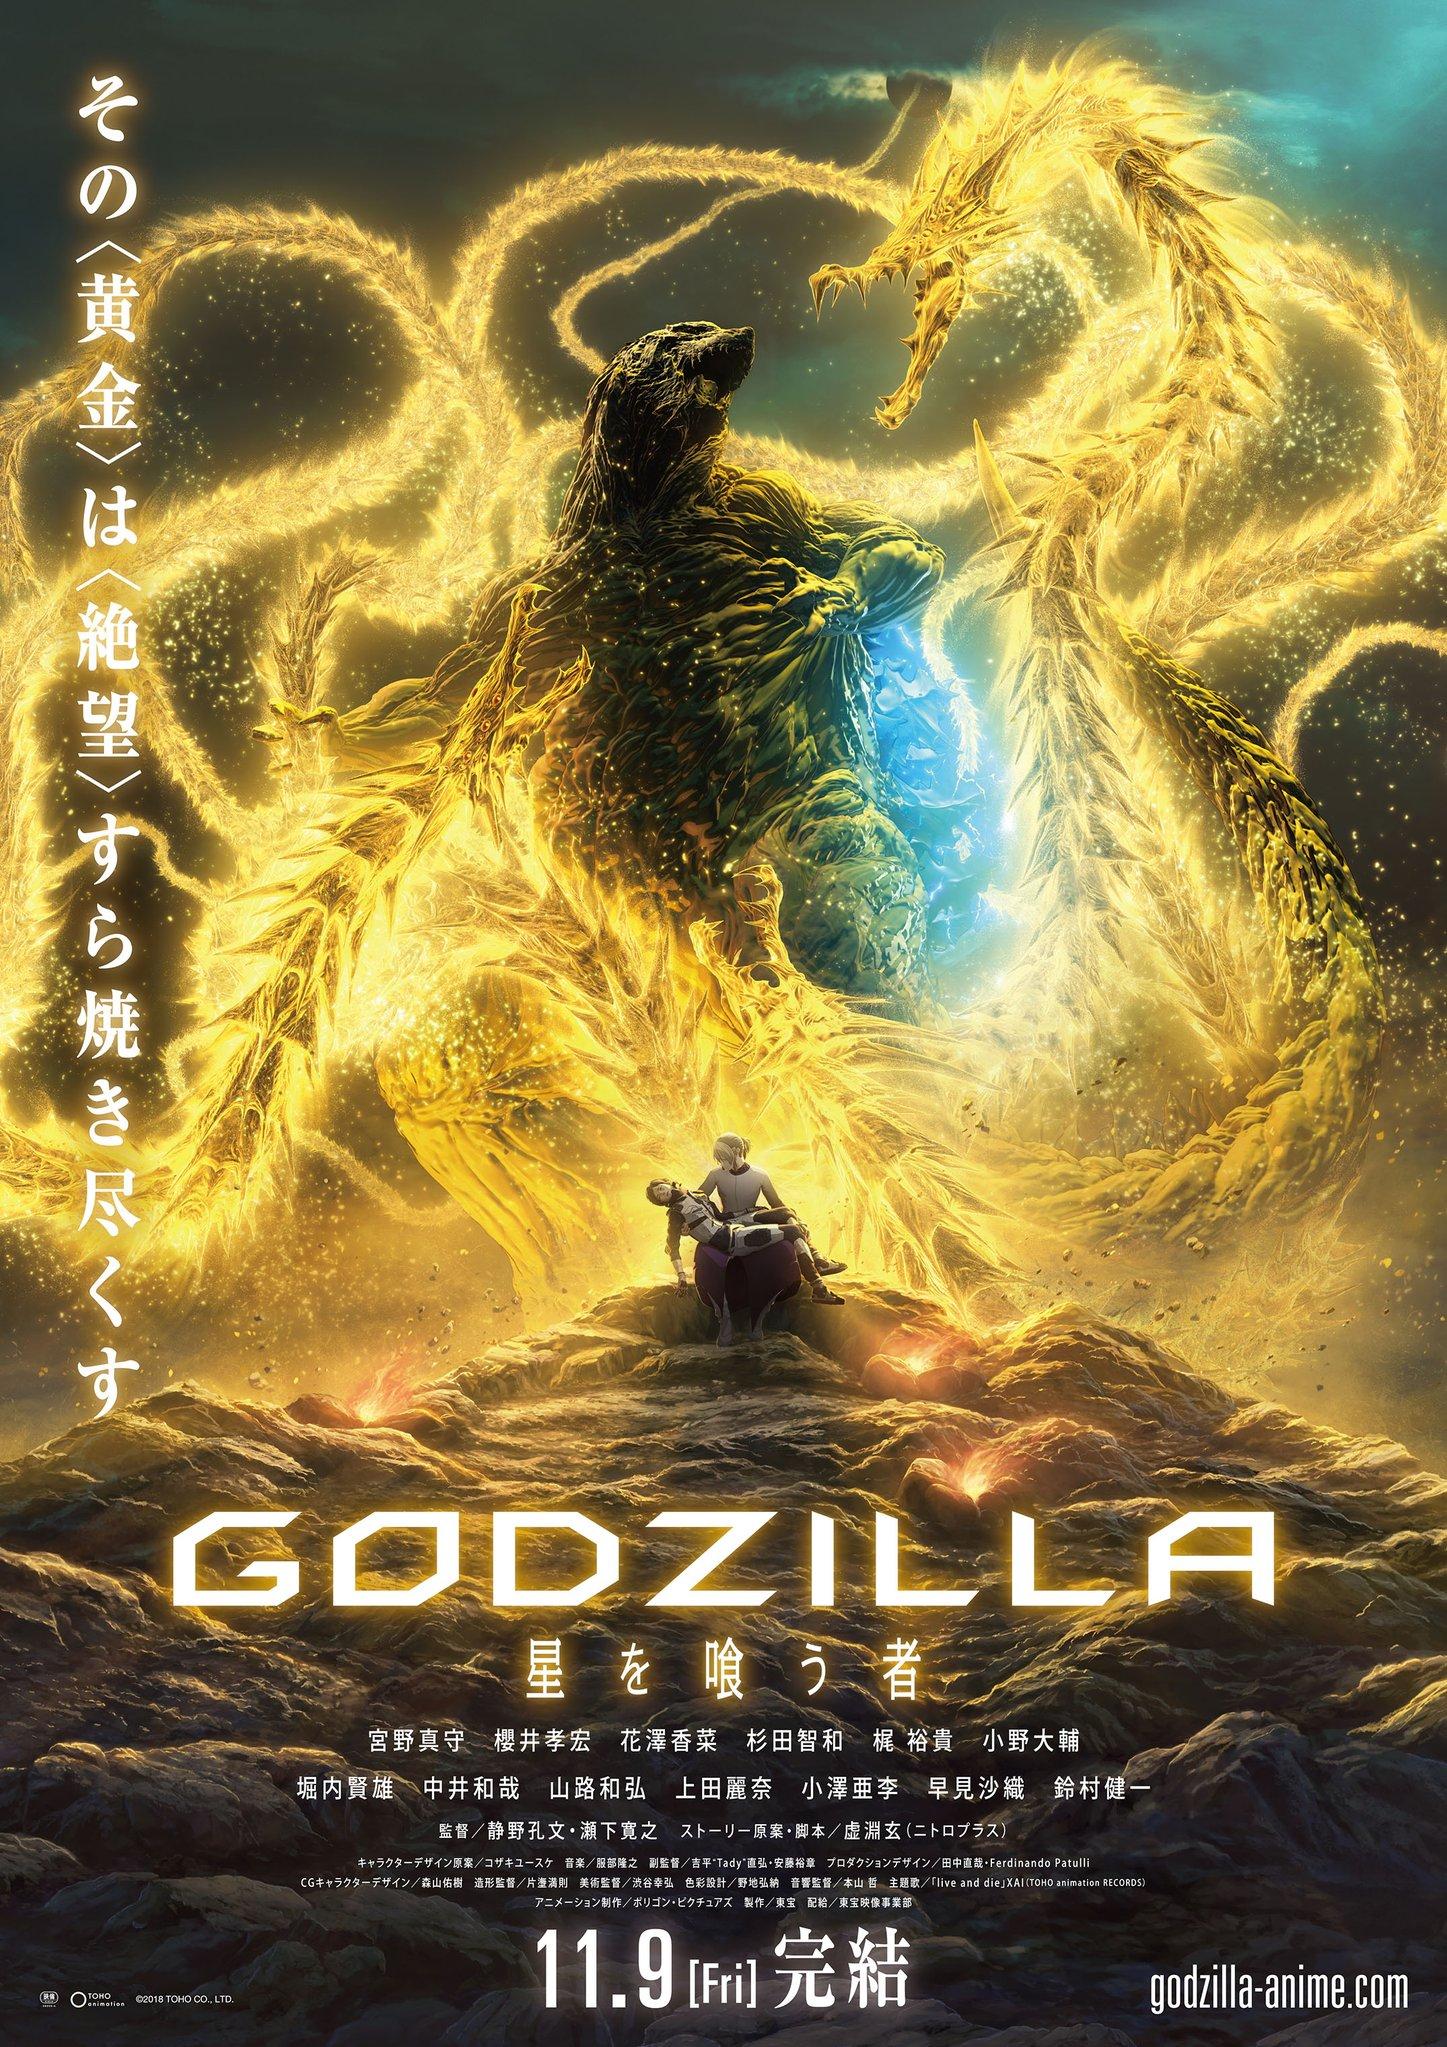 Godzilla comic con teaser online dating